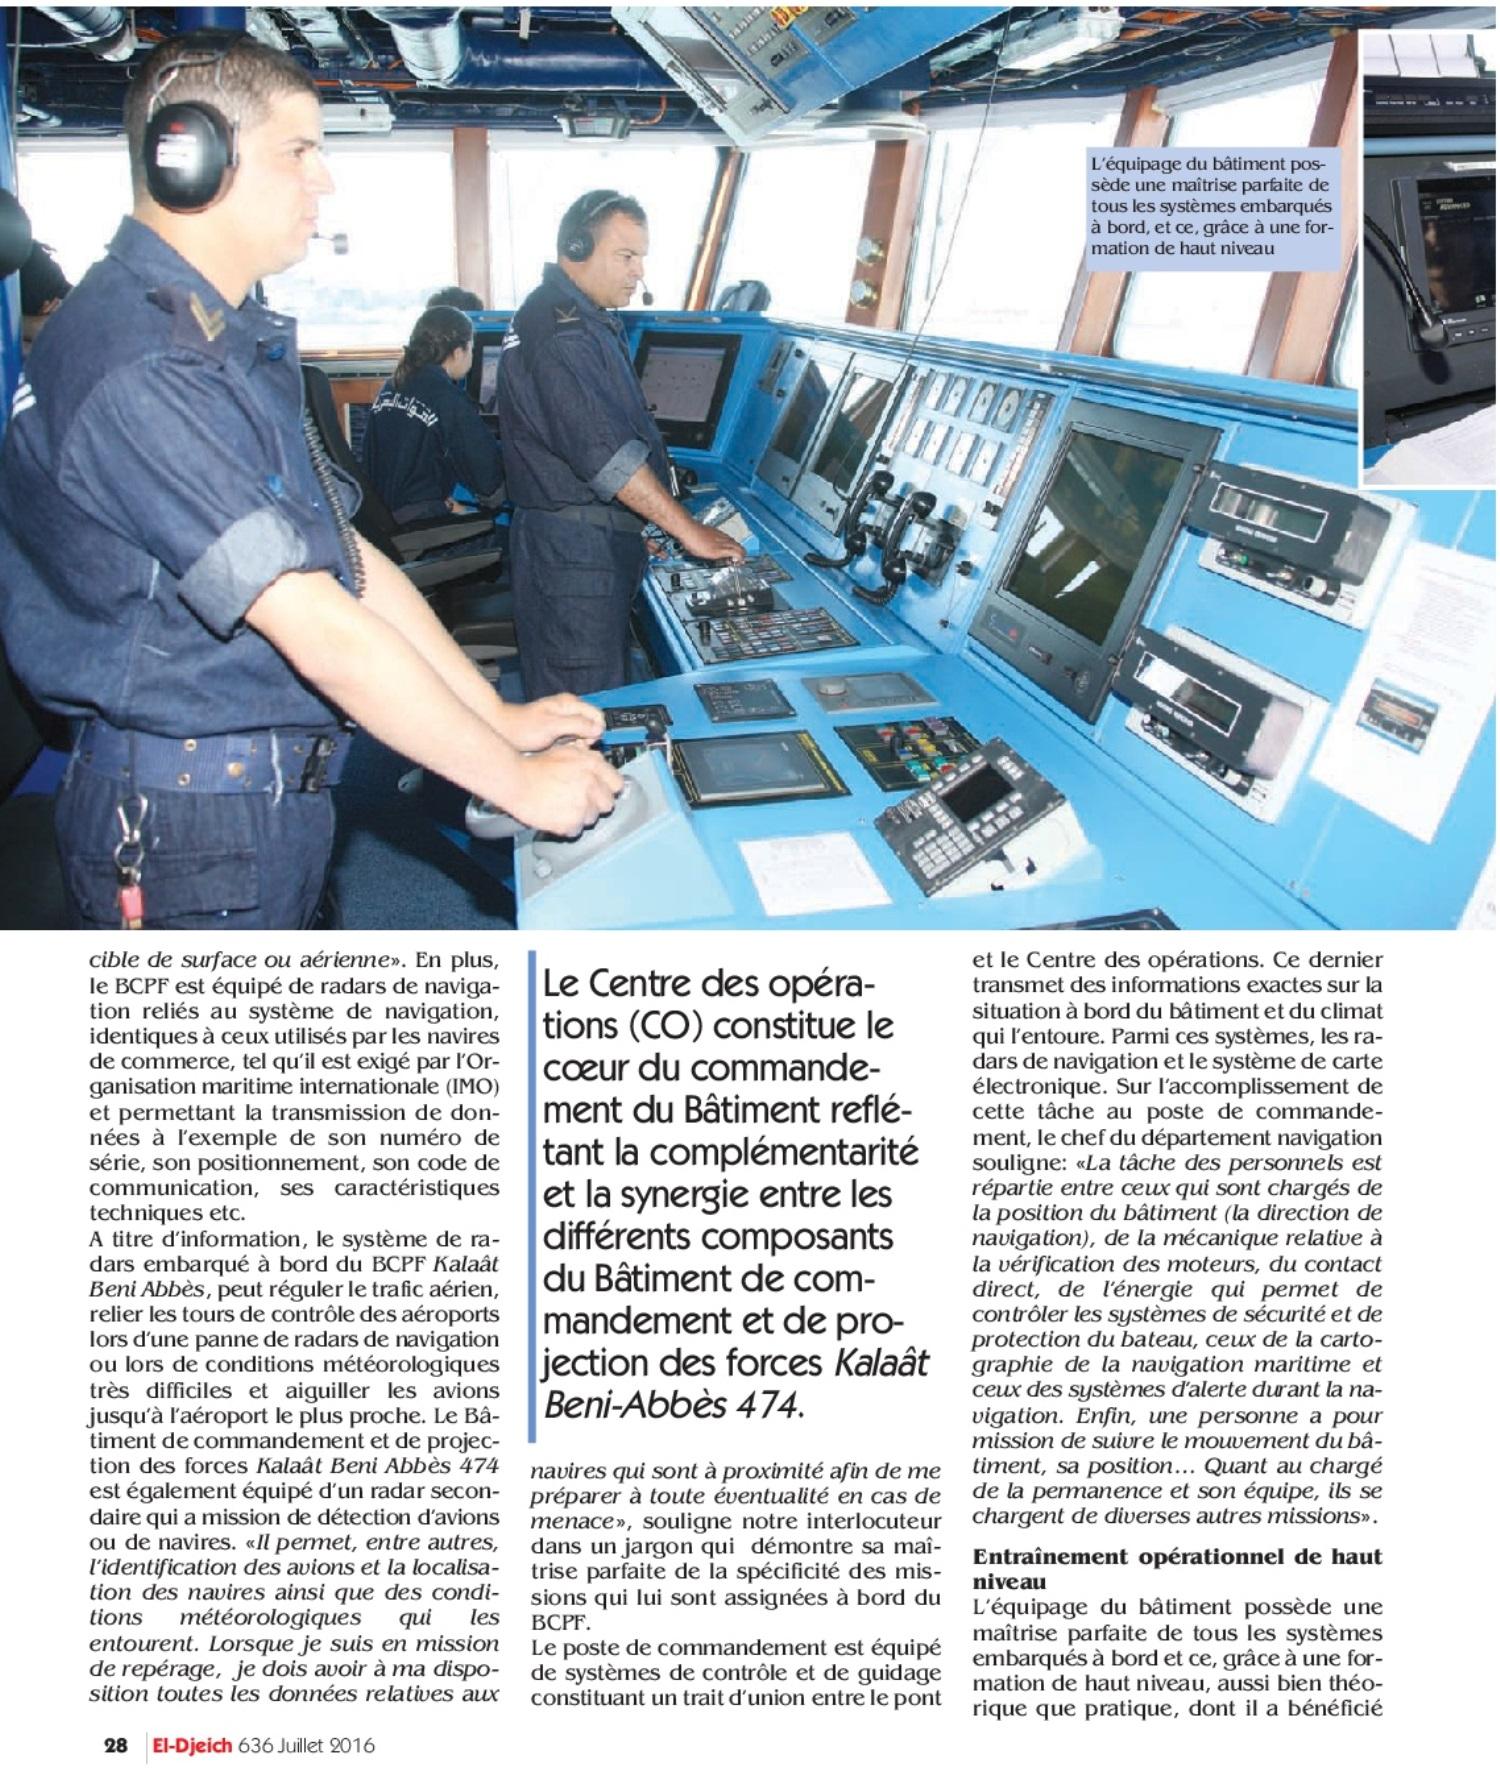 Armée Algérienne (ANP) - Tome XIV - Page 37 27736568784_ca9572d200_o